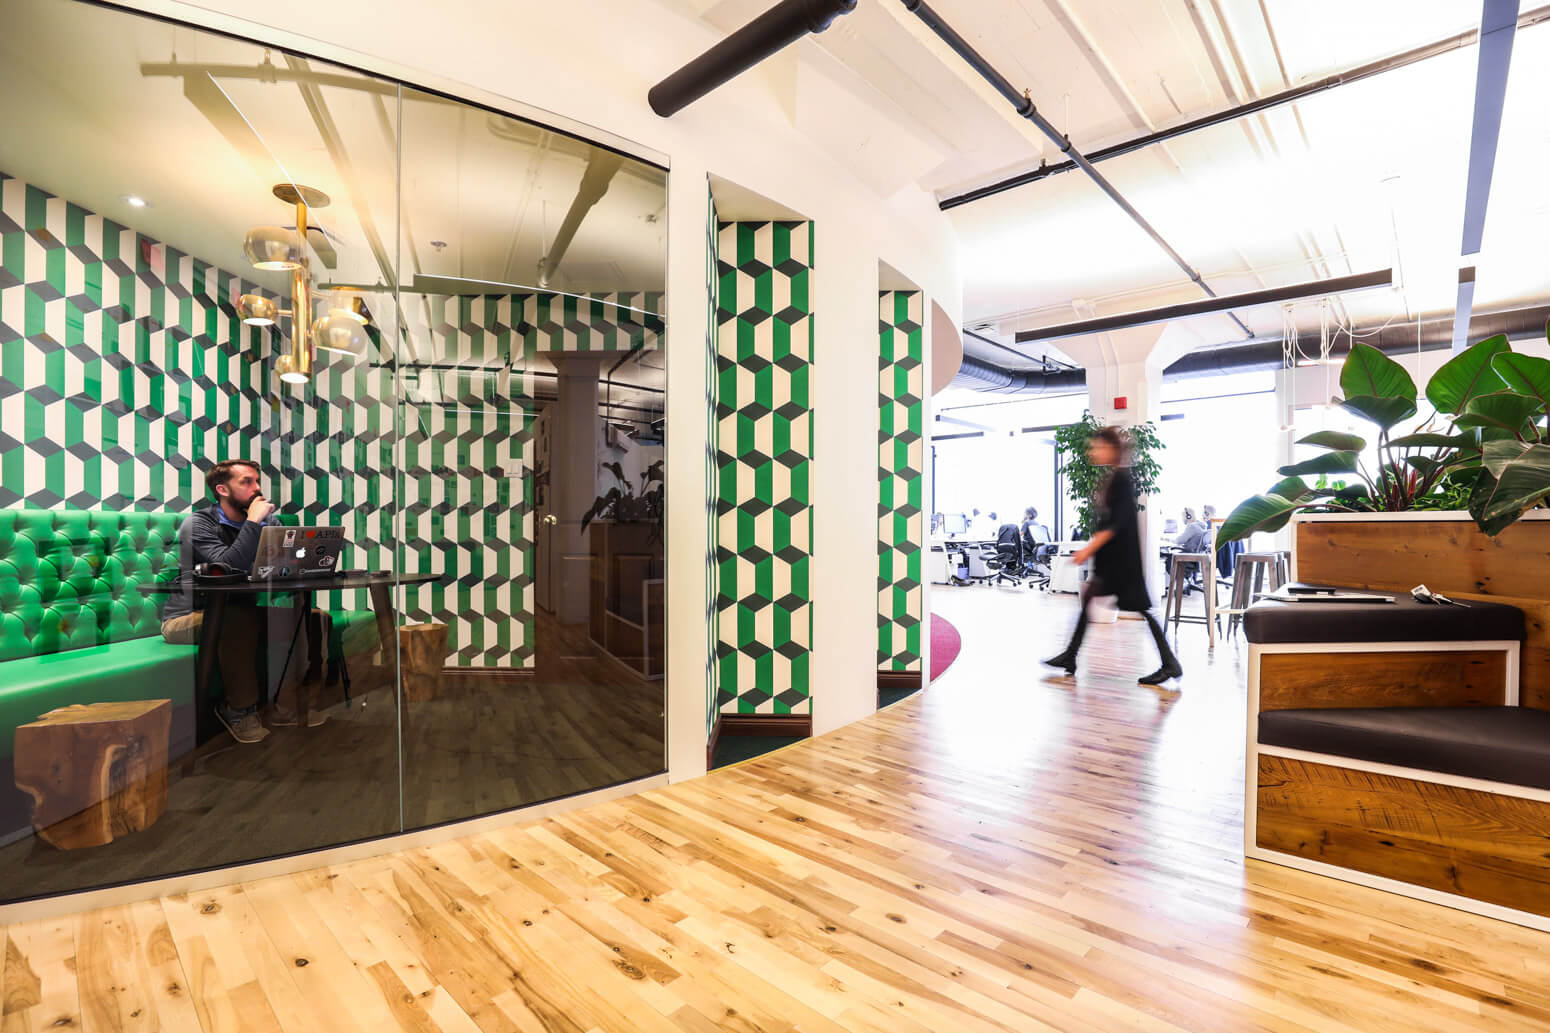 Shutterstock Montreal Office Killer Spaces-9